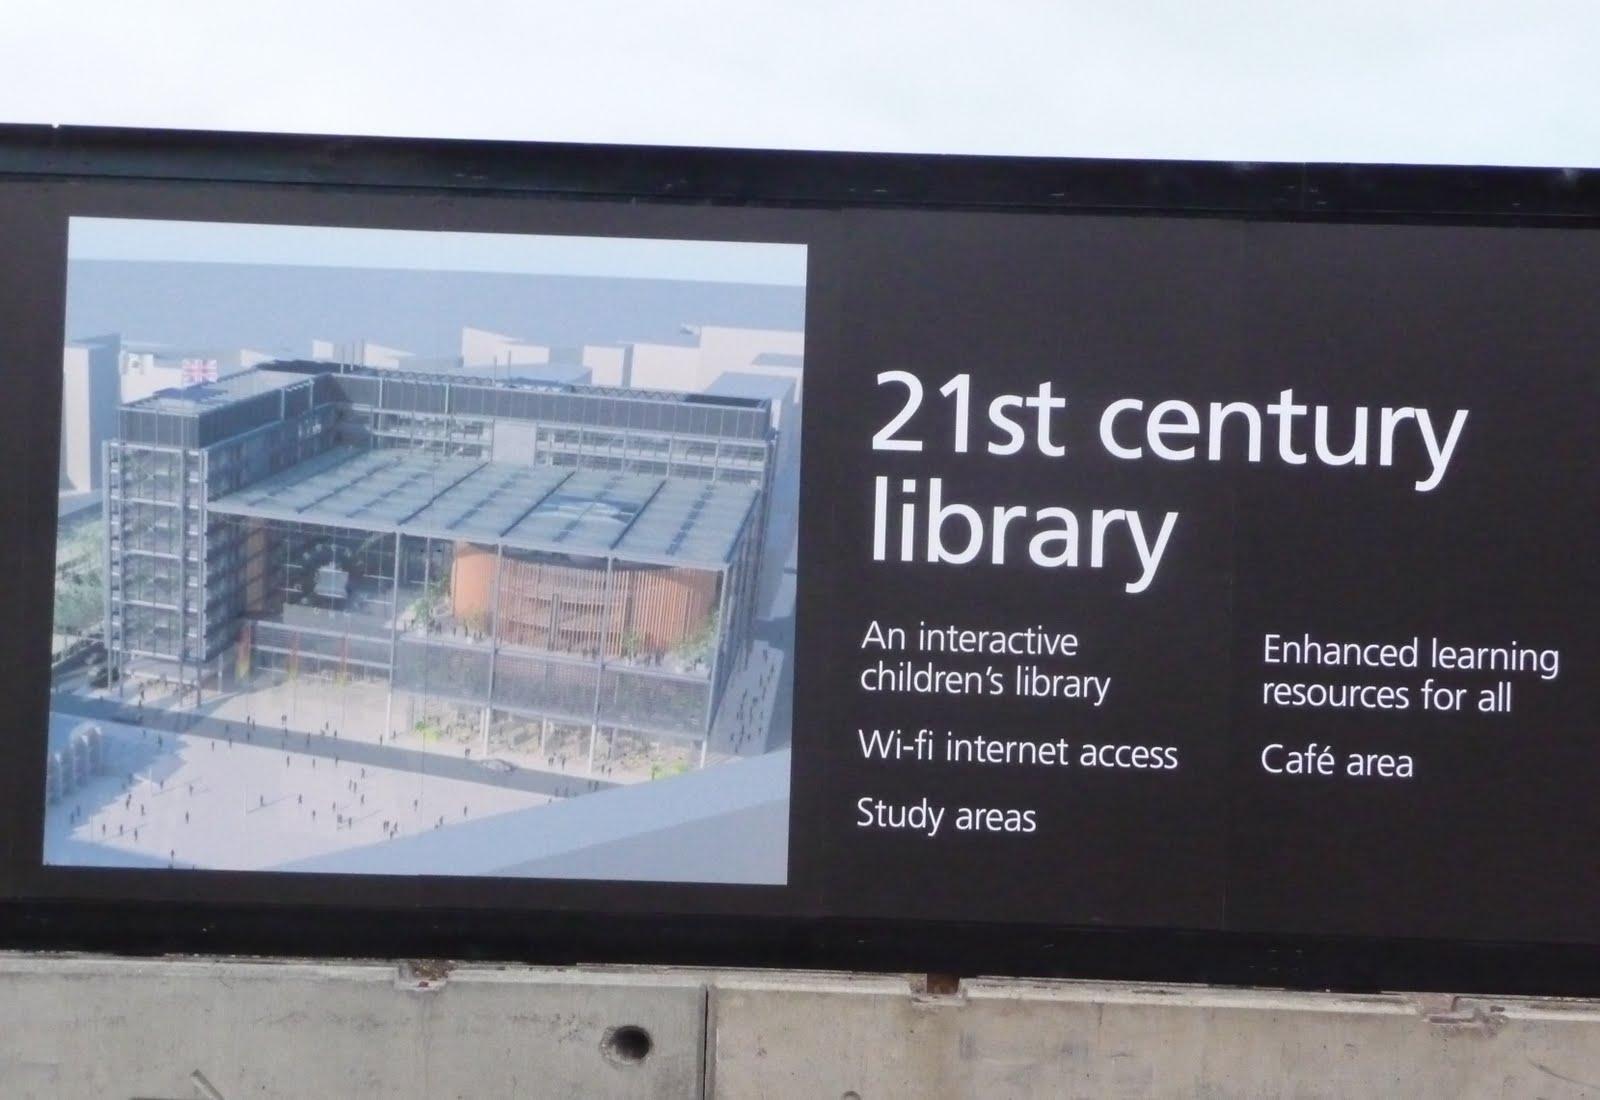 http://4.bp.blogspot.com/-3pcoNPnMqrA/Ta7rxmC1thI/AAAAAAAAA5I/IZafMH4ETvI/s1600/civic+centre+library.JPG